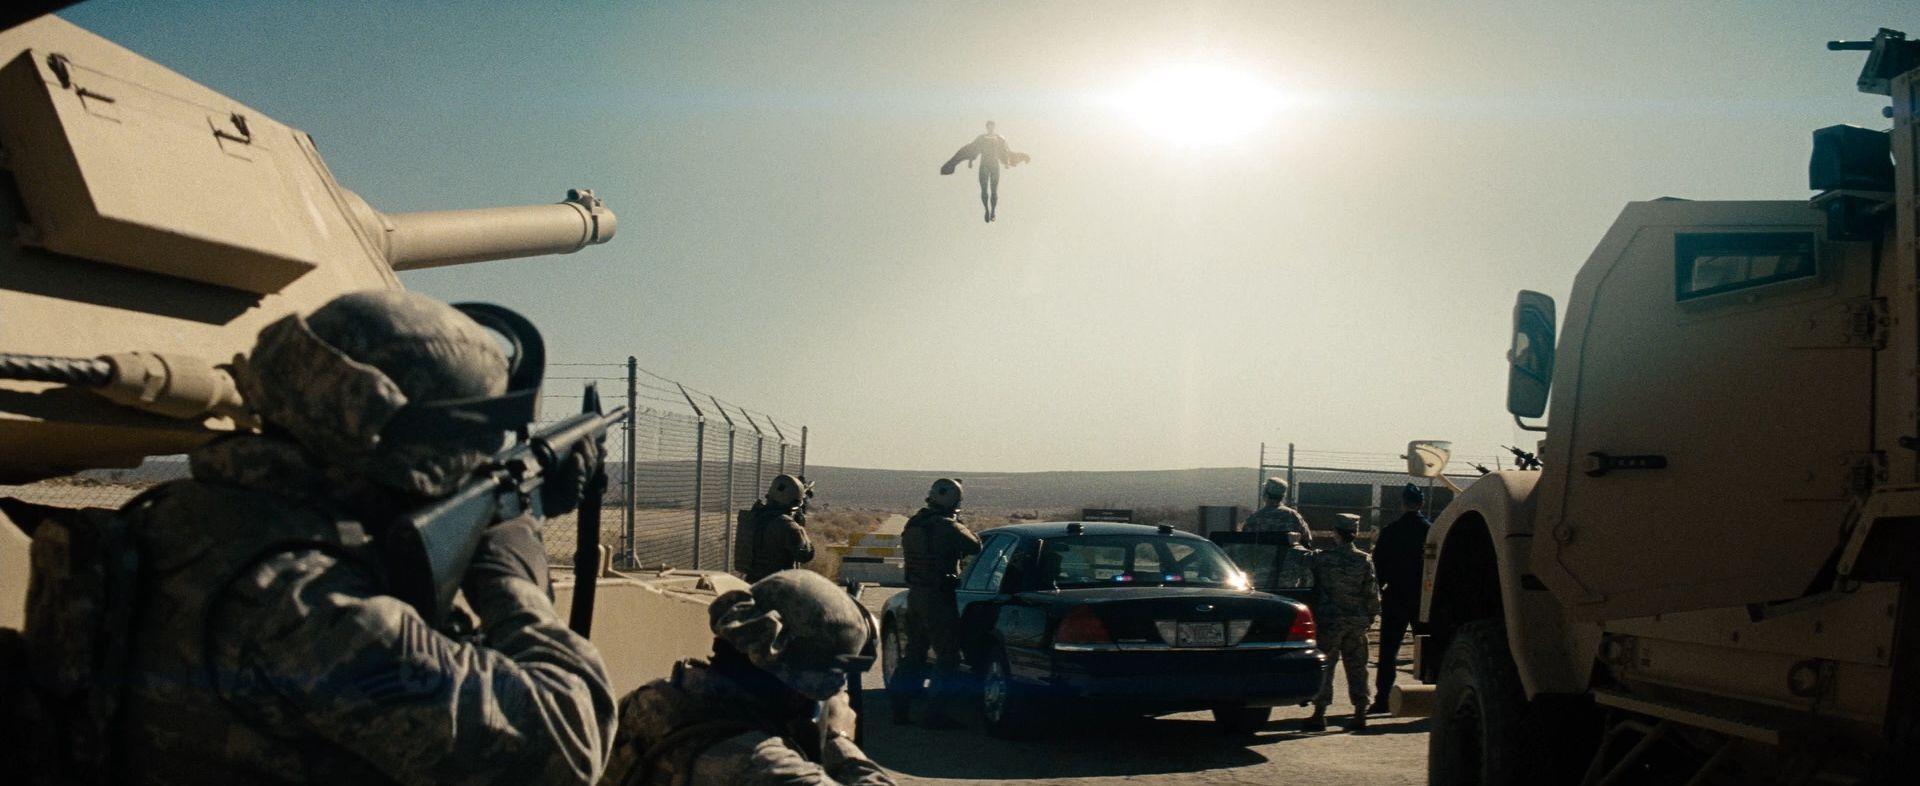 MAN OF STEEL (2013)  DP: Amir Mokri Director: Zack Snyder More Shots: https://t.co/EQWfIGs9fq https://t.co/DMkdT9YJvl